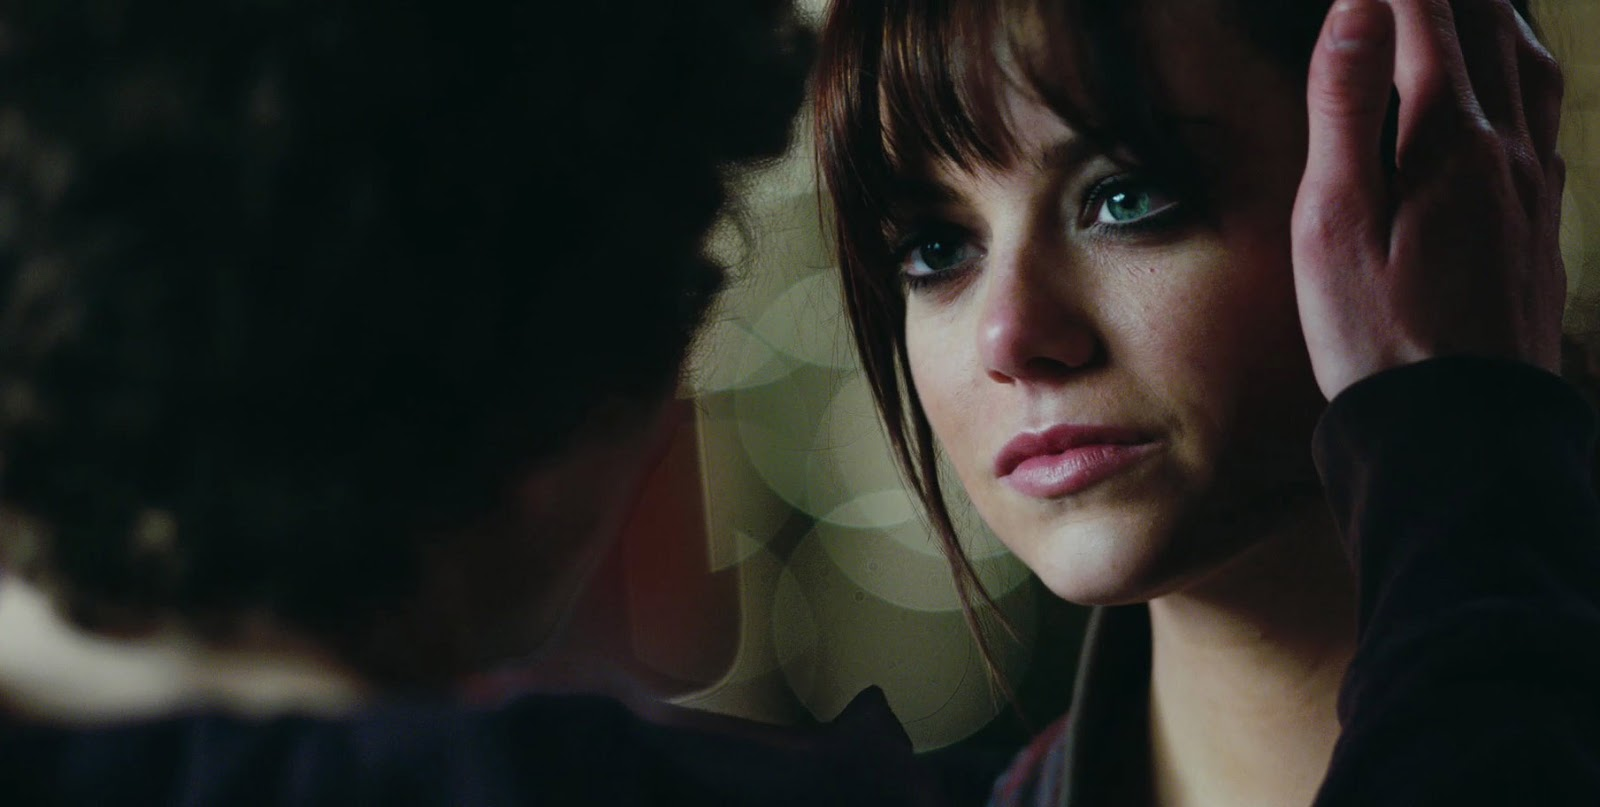 Andrew Garfield Wallpaper Iphone Emma Stone Emma Stone Zombieland